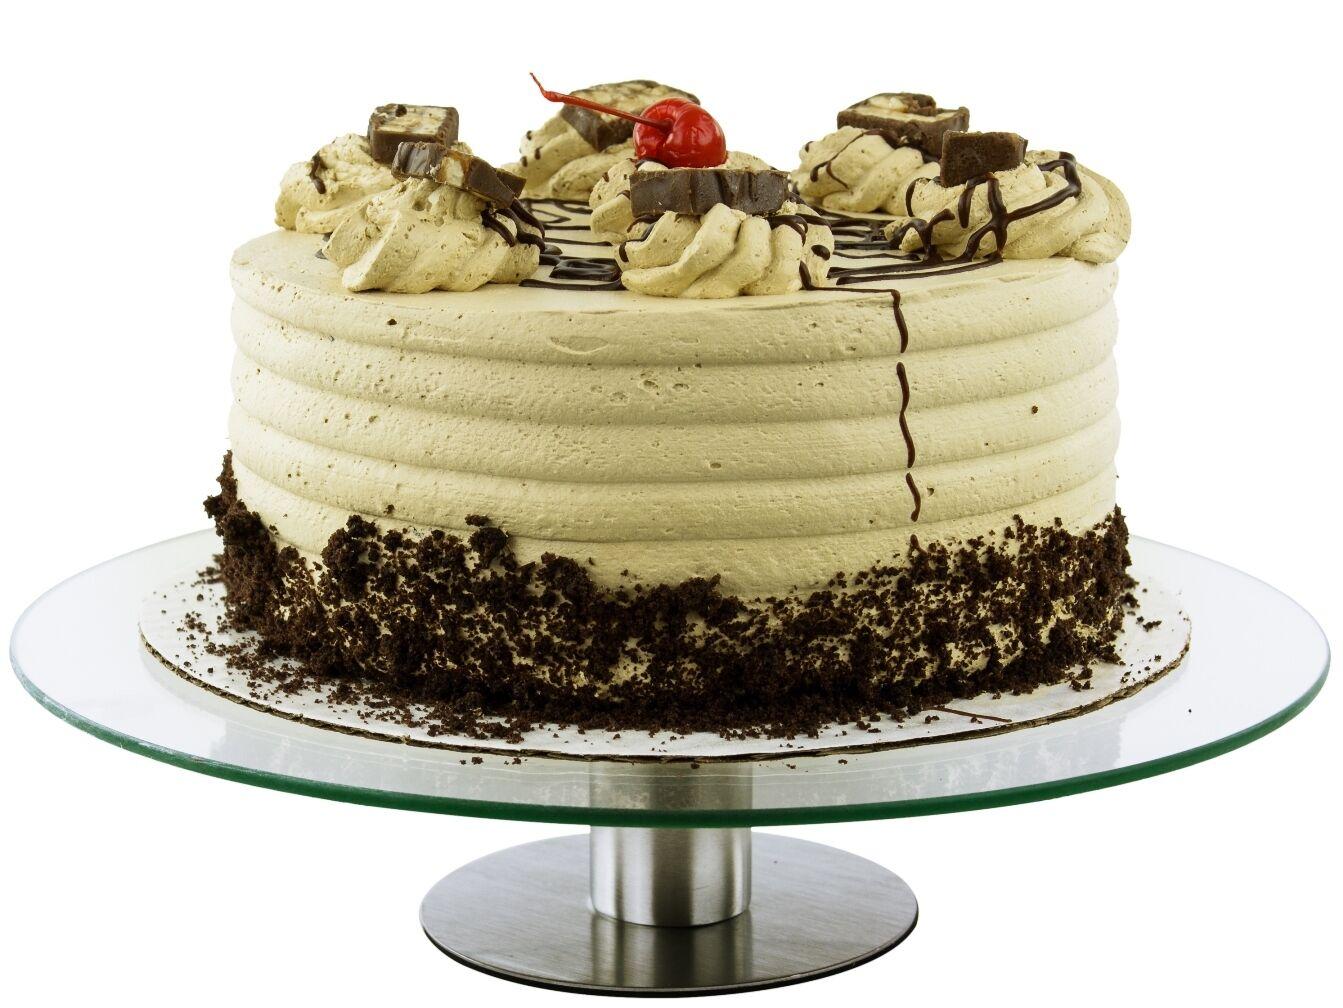 Wedding Cake Stands & Plates , Wedding Supplies , Home & Garden